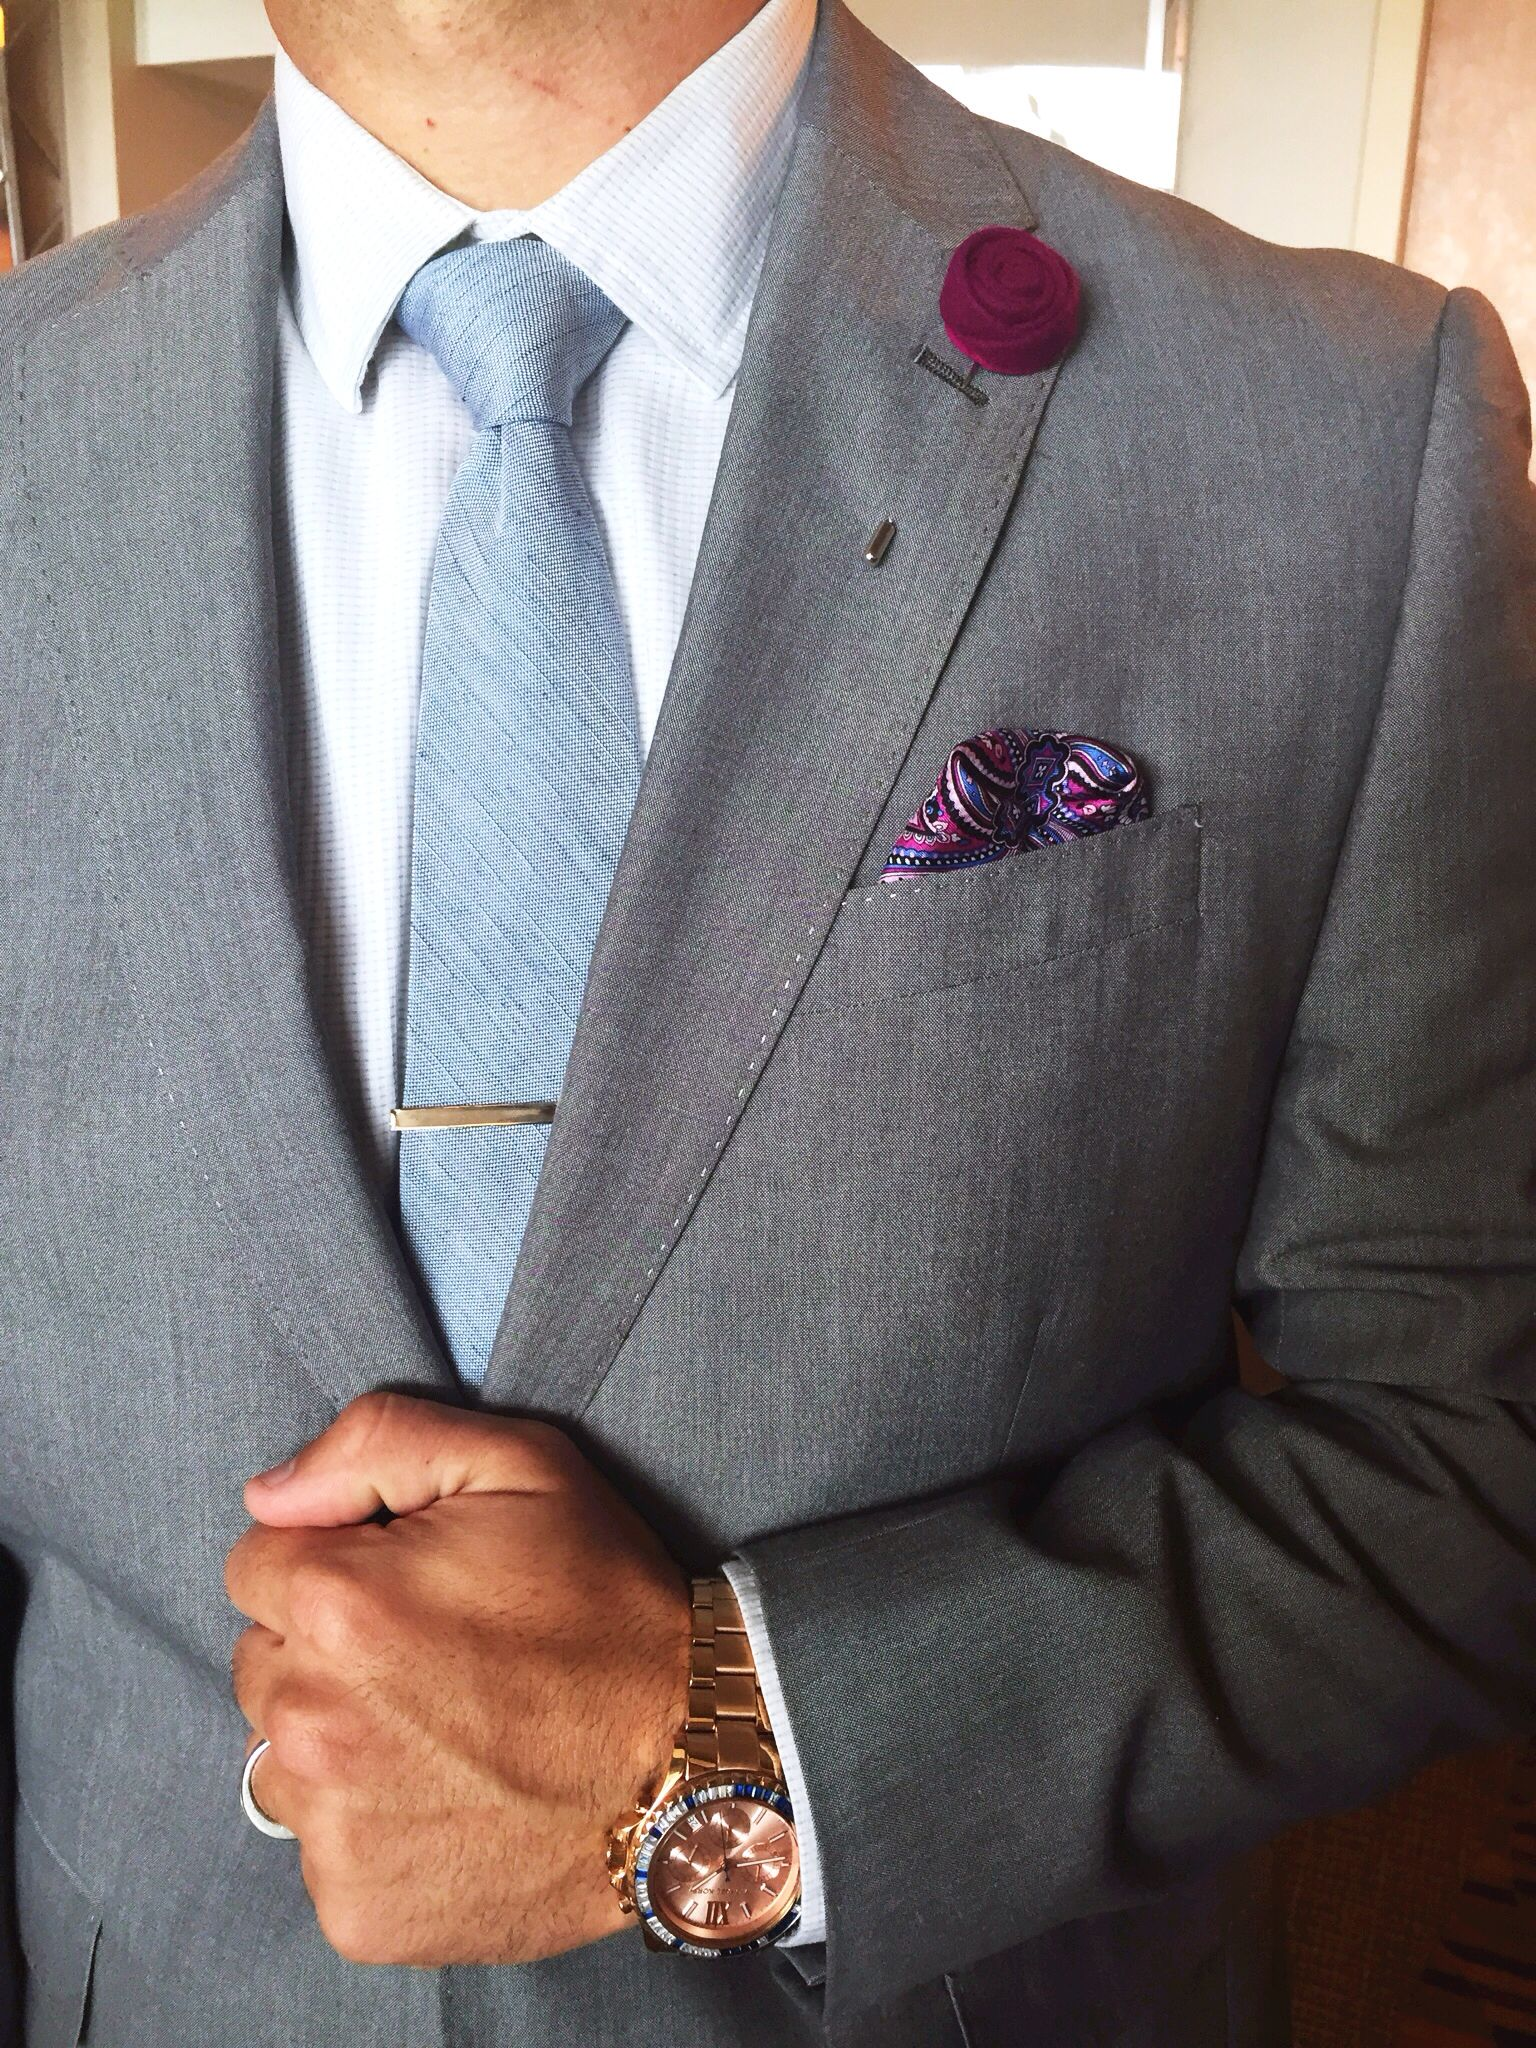 70f239d6daa1 Slate grey suit, white shirt, sky blue tie with tie bar, plum color lapel  flower, blue and plum print pocket square.